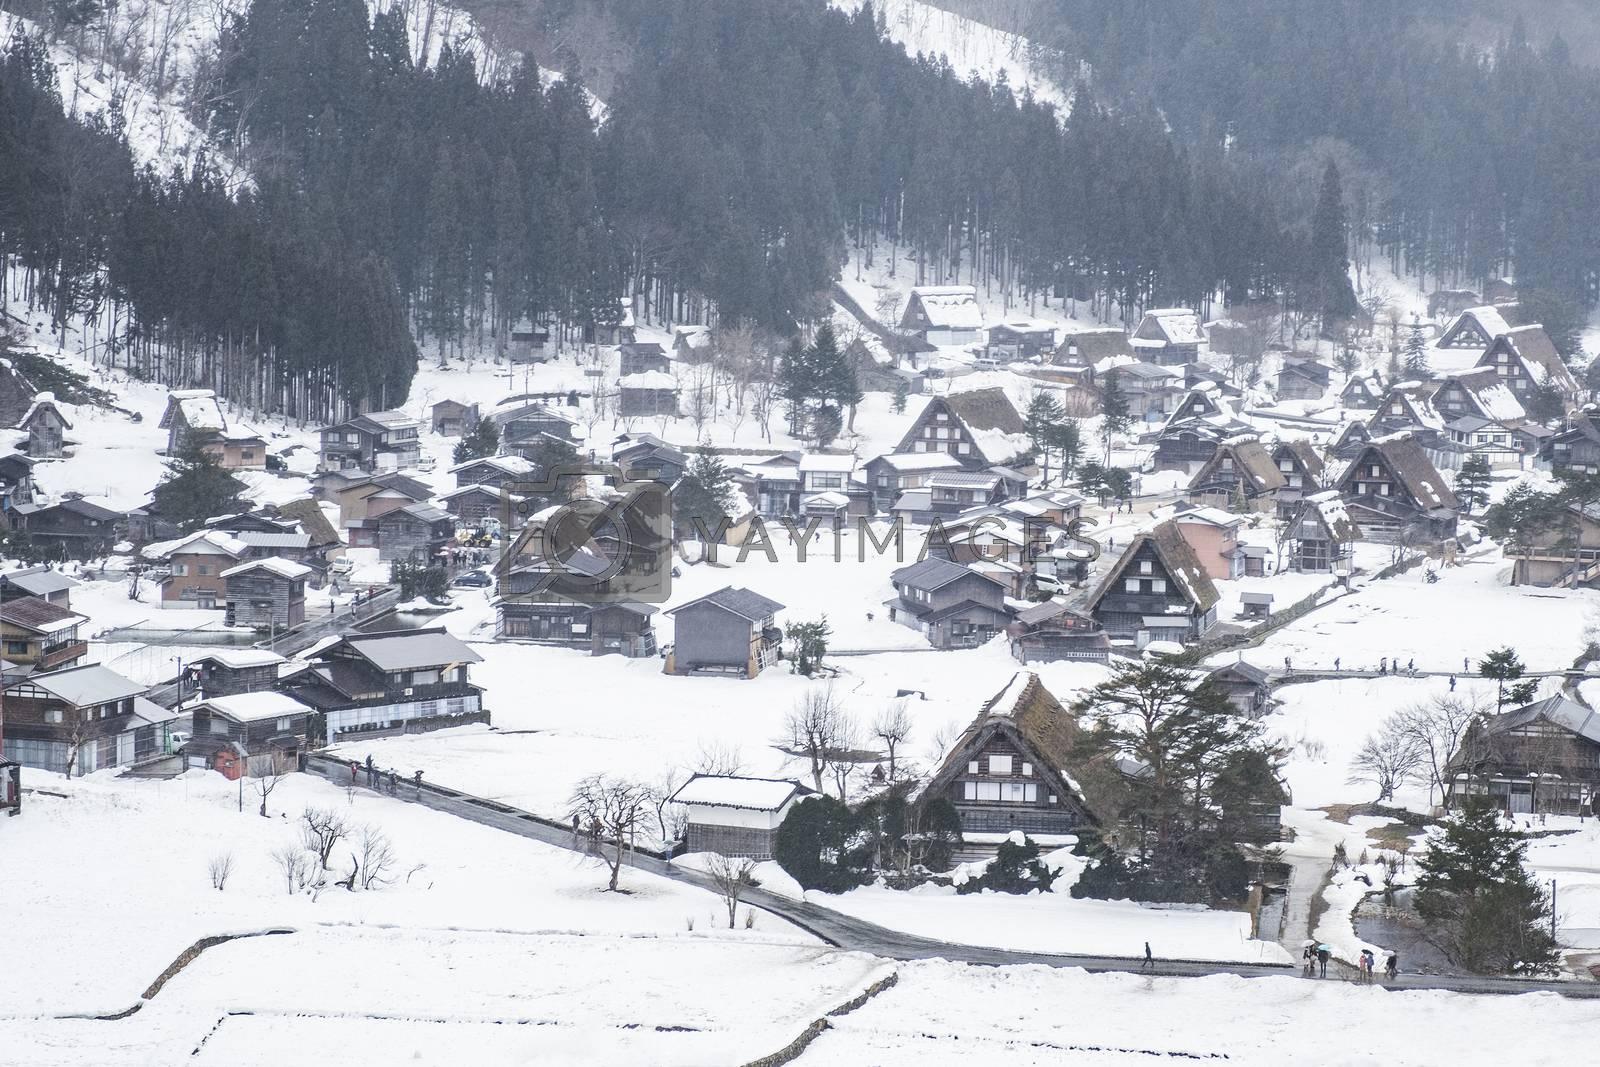 World Heritage Site Shirakawago Village in Winter, Japan